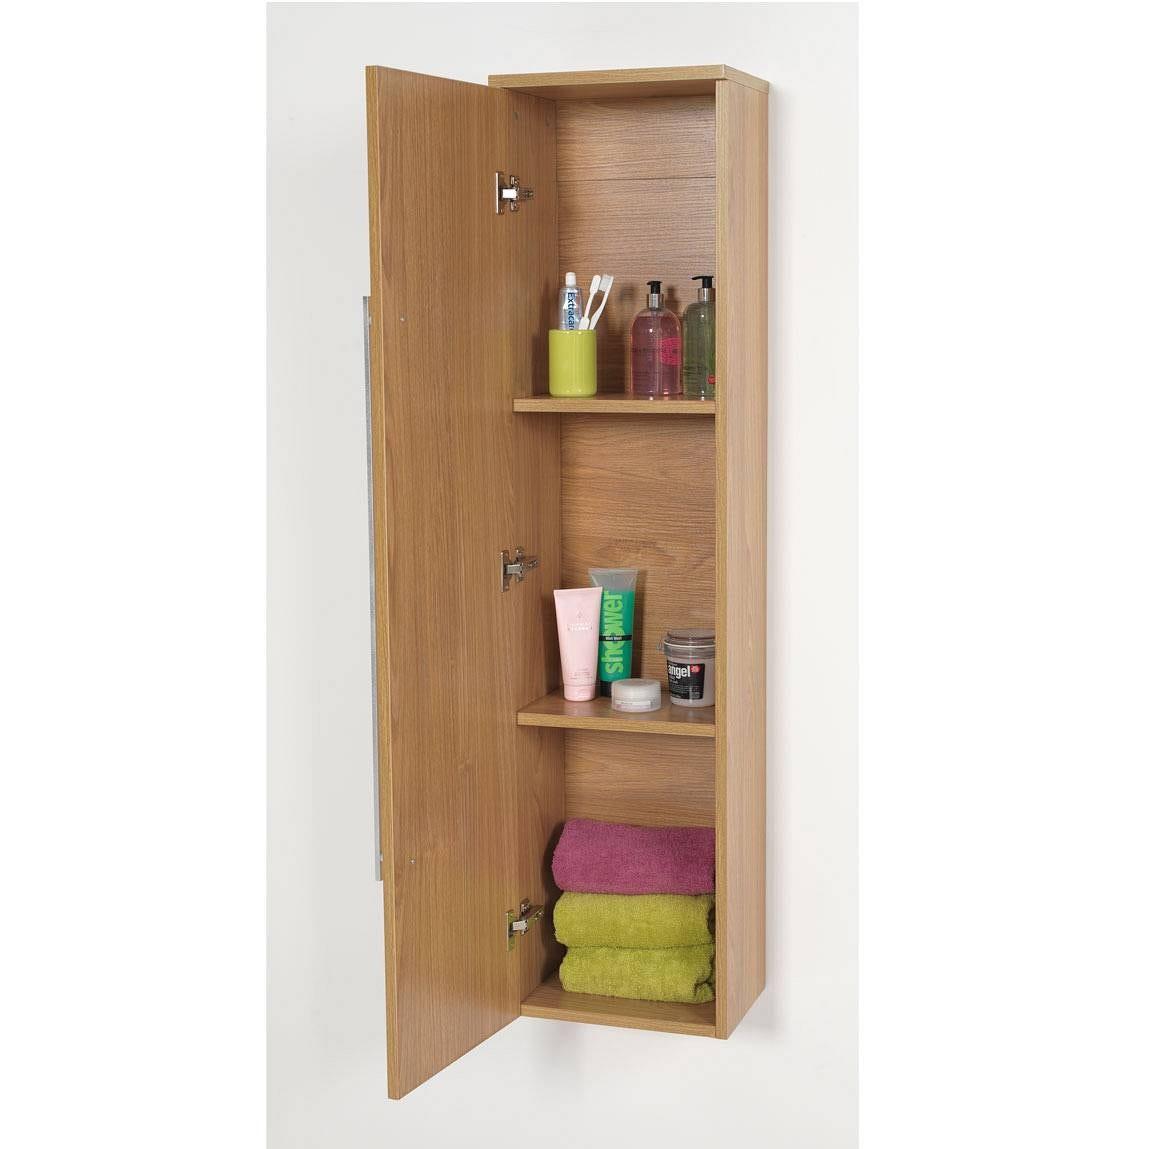 bathroom door cabinets simpli cabinet two org avington cubbies home wall l with livingoracles oak